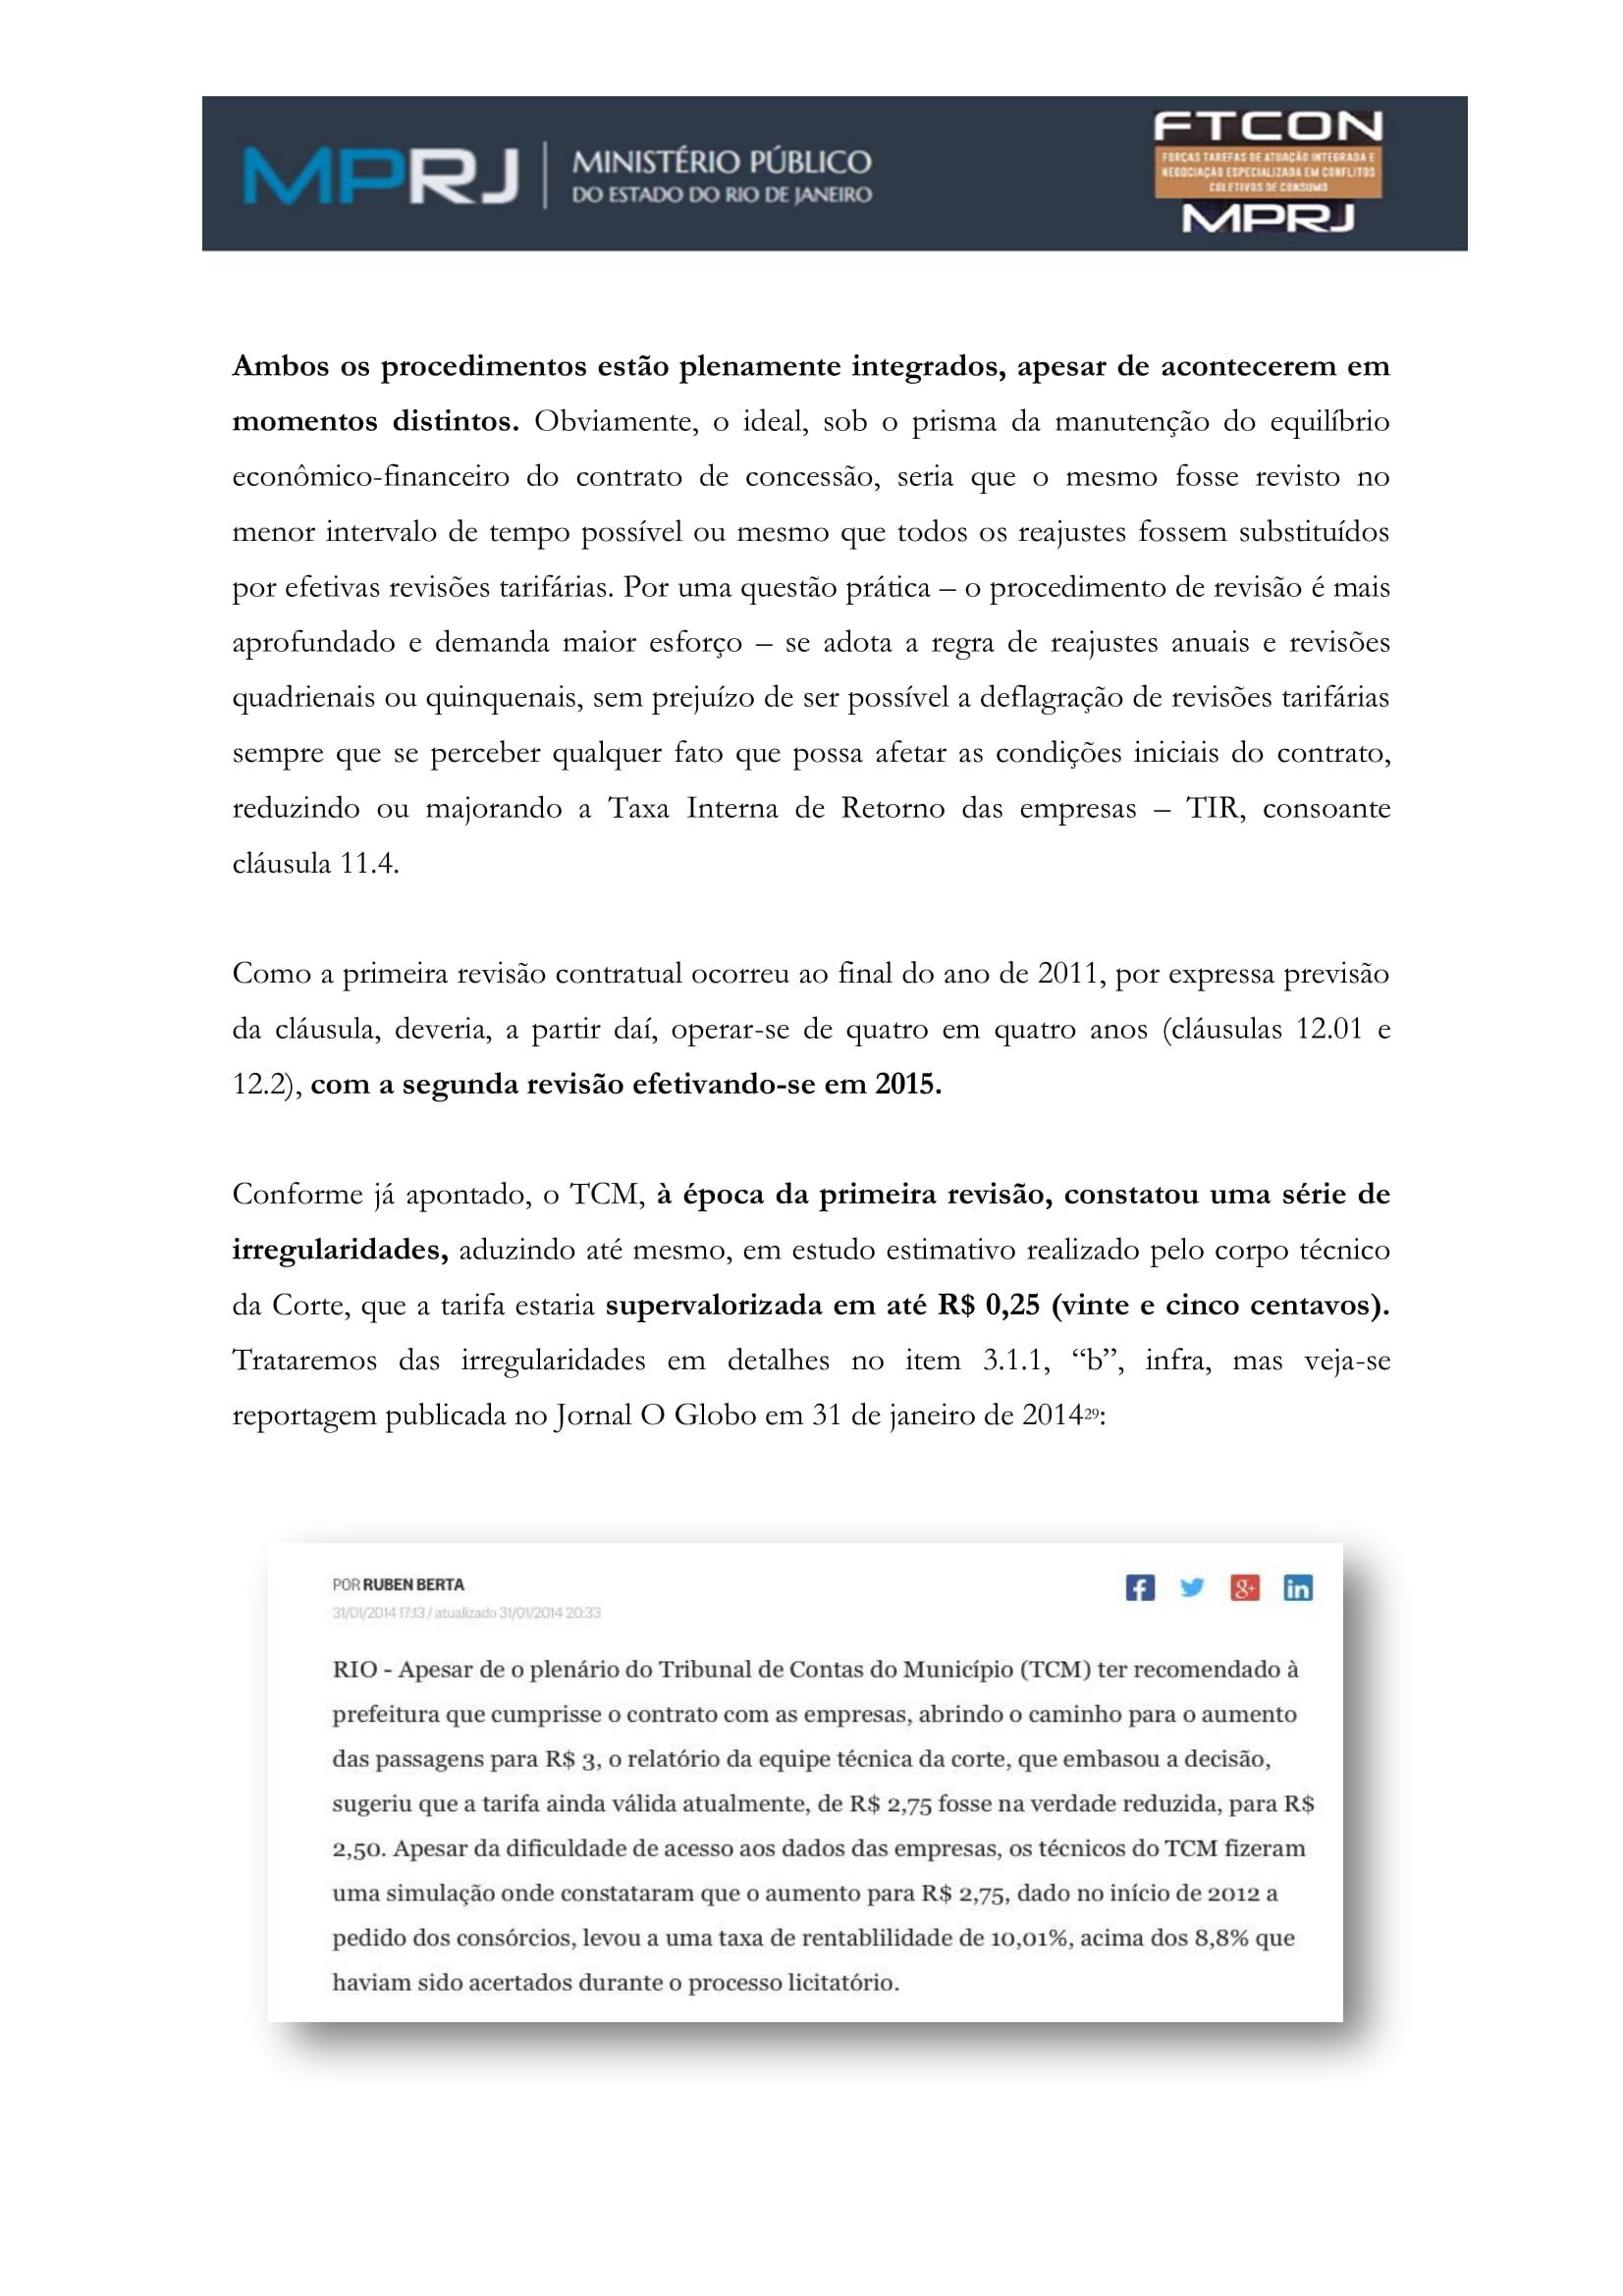 acp_caducidade_onibus_dr_rt-051